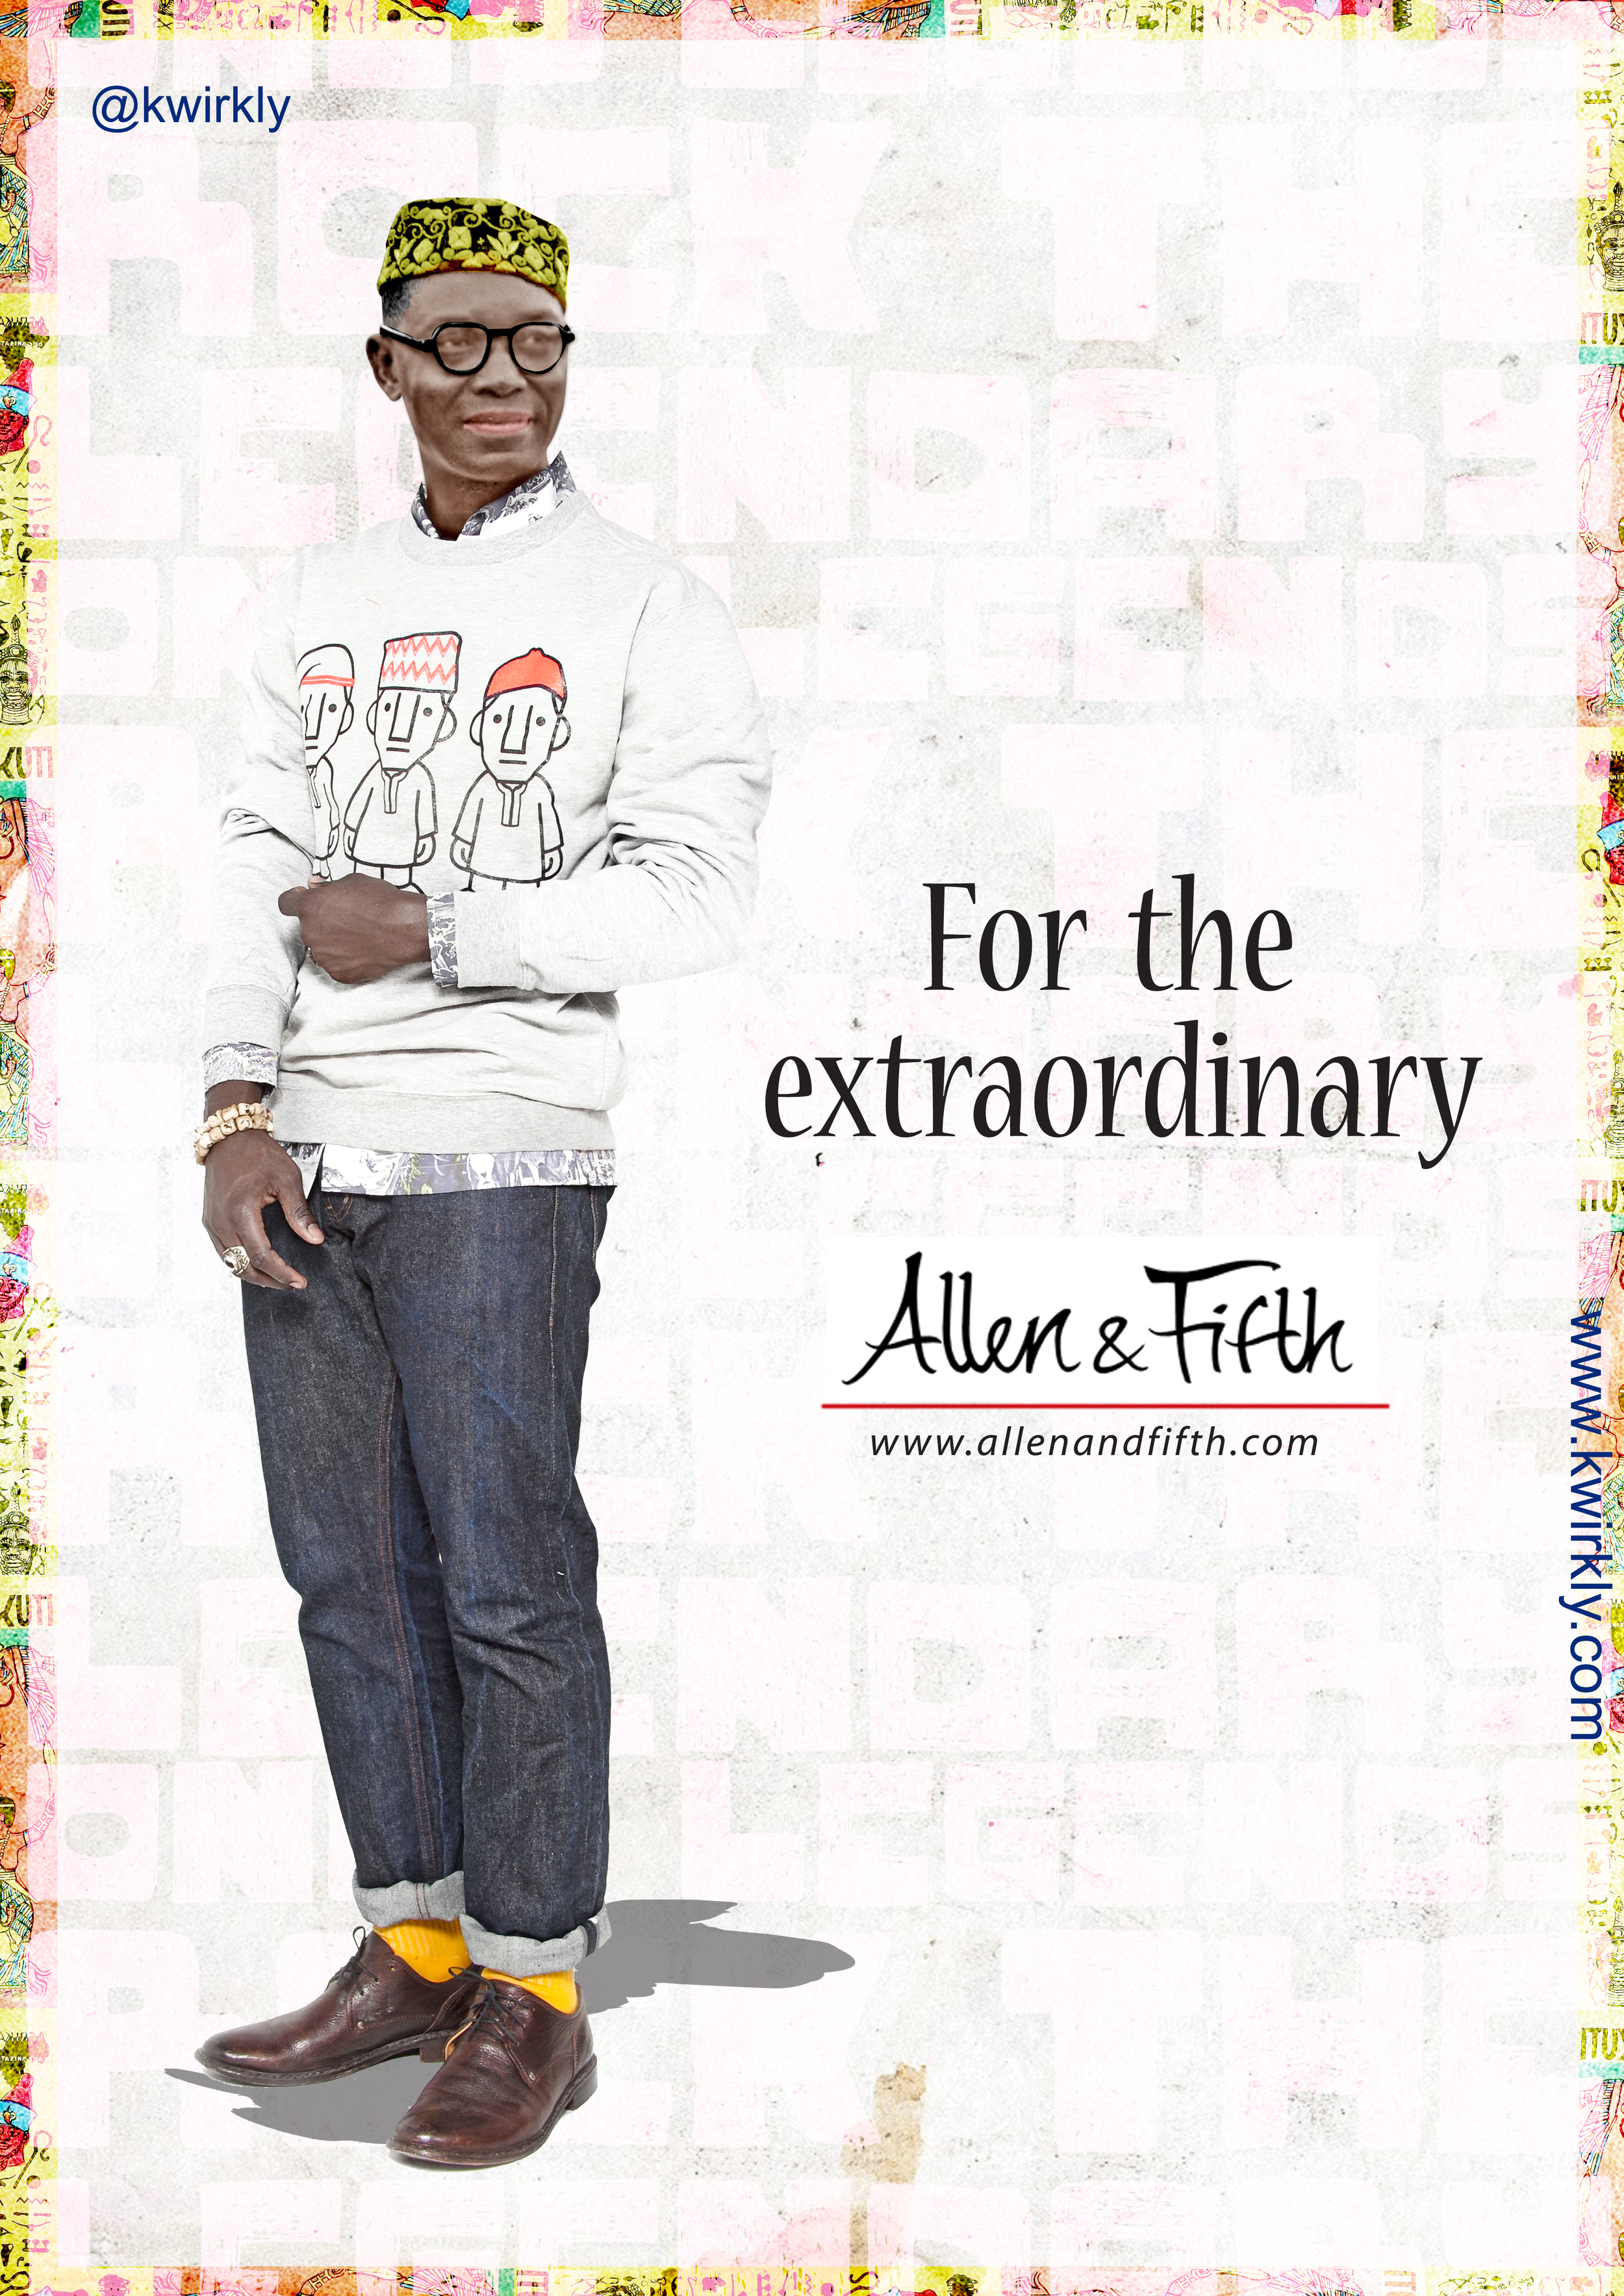 Allen&Fifth_Azikiwe_Kwirkly.jpg